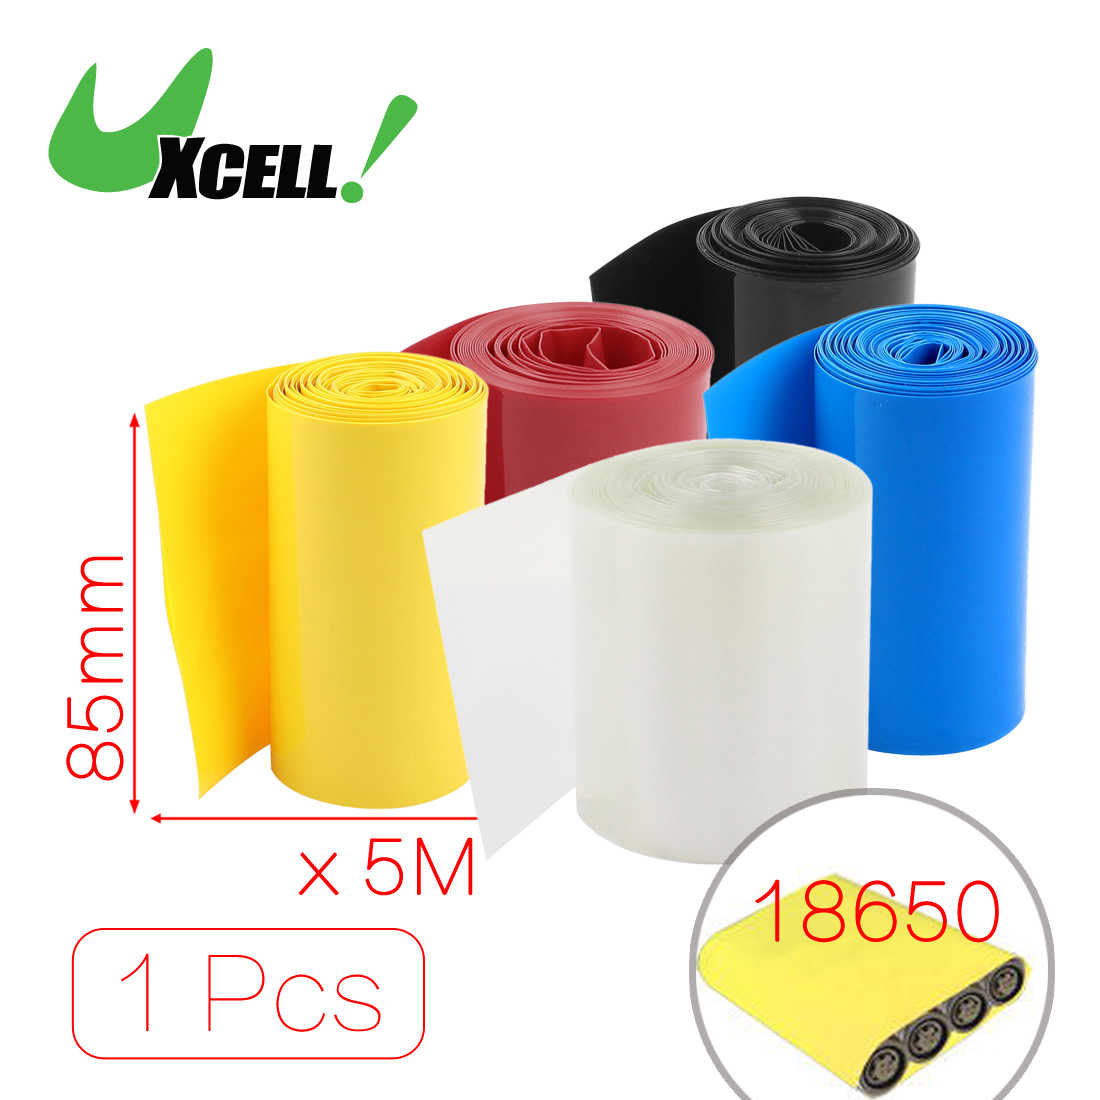 все цены на Uxcell 5Meters 85Mm Width PVC Heat Shrink Wrap Tube Blue For 18650 Battery Pack Black Blue Clear Red Yellow Heat Shrink Tubing онлайн